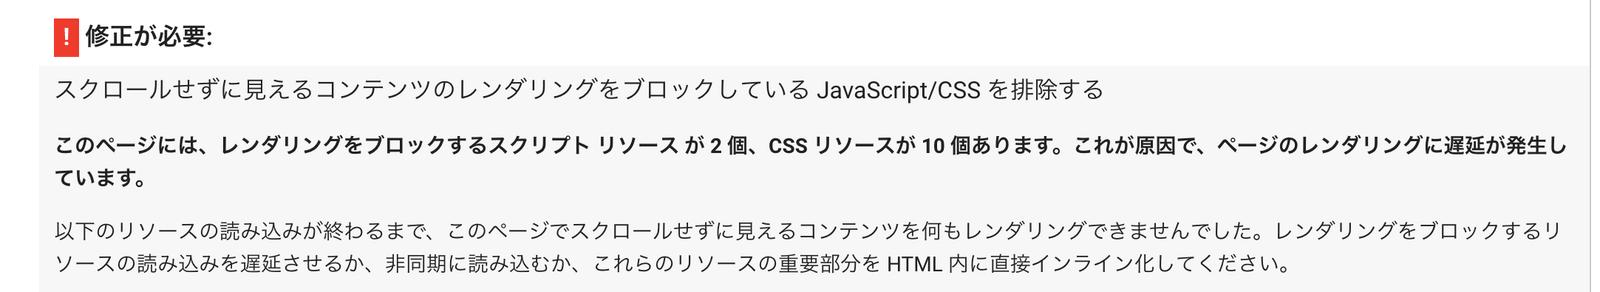 JavaScriptとCSSの配信方法で怒られる人多数